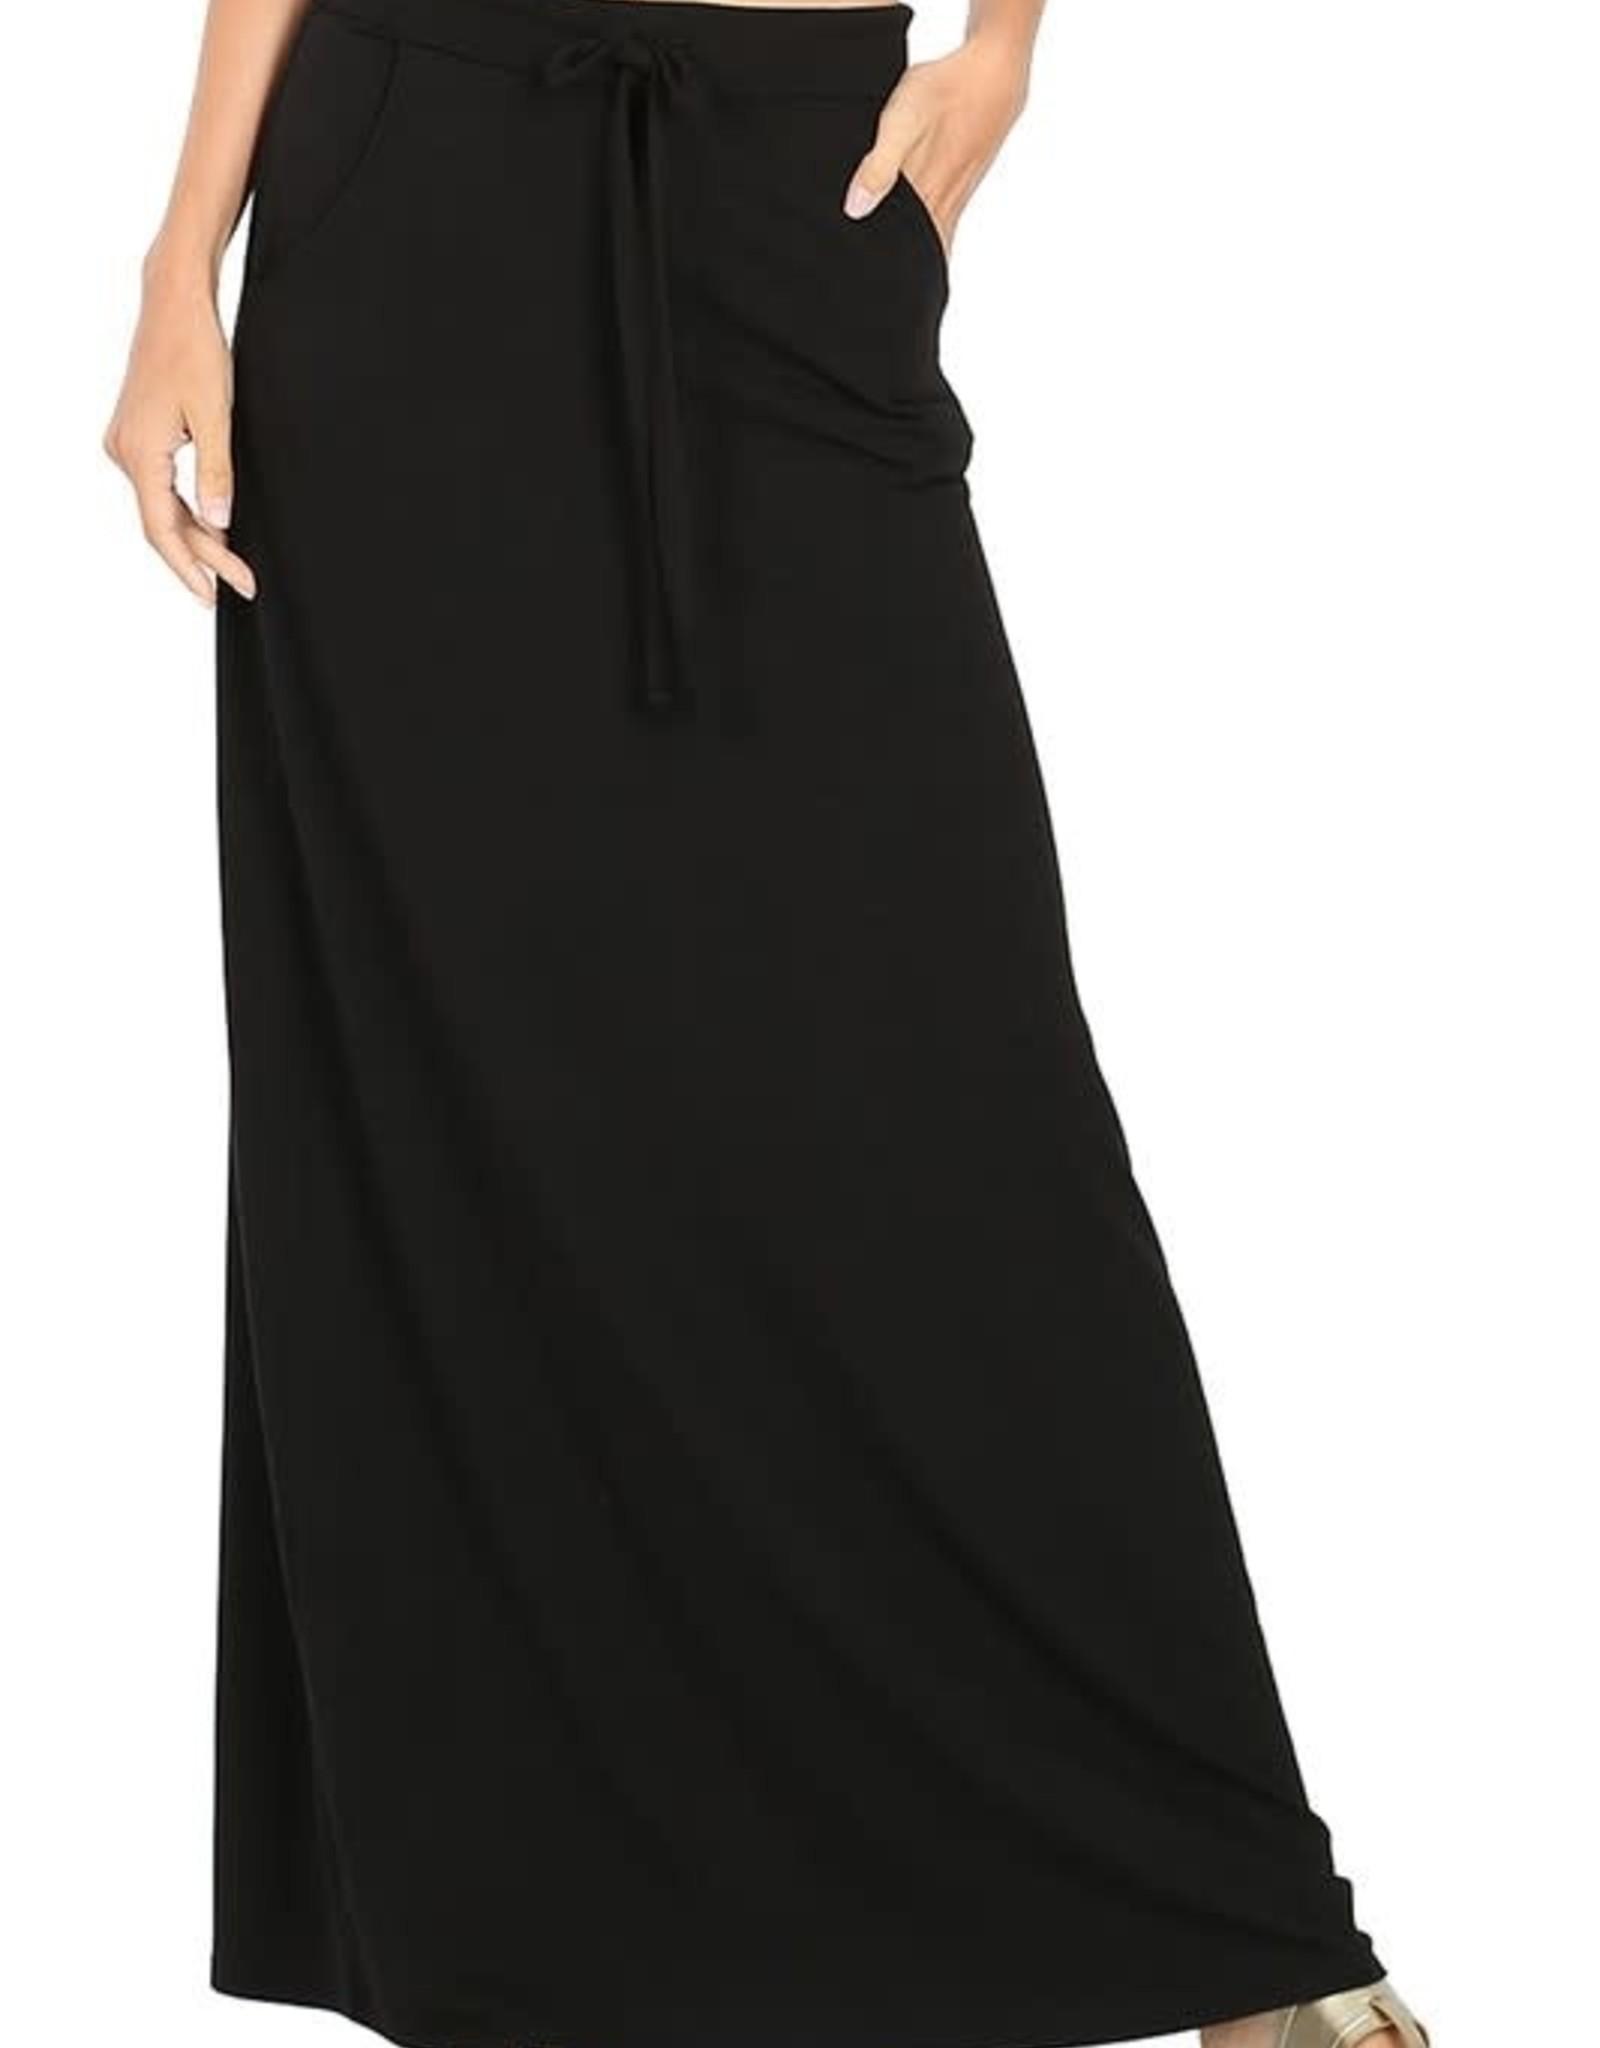 - Black Maxi Skirt w/Drawstring & Pockets